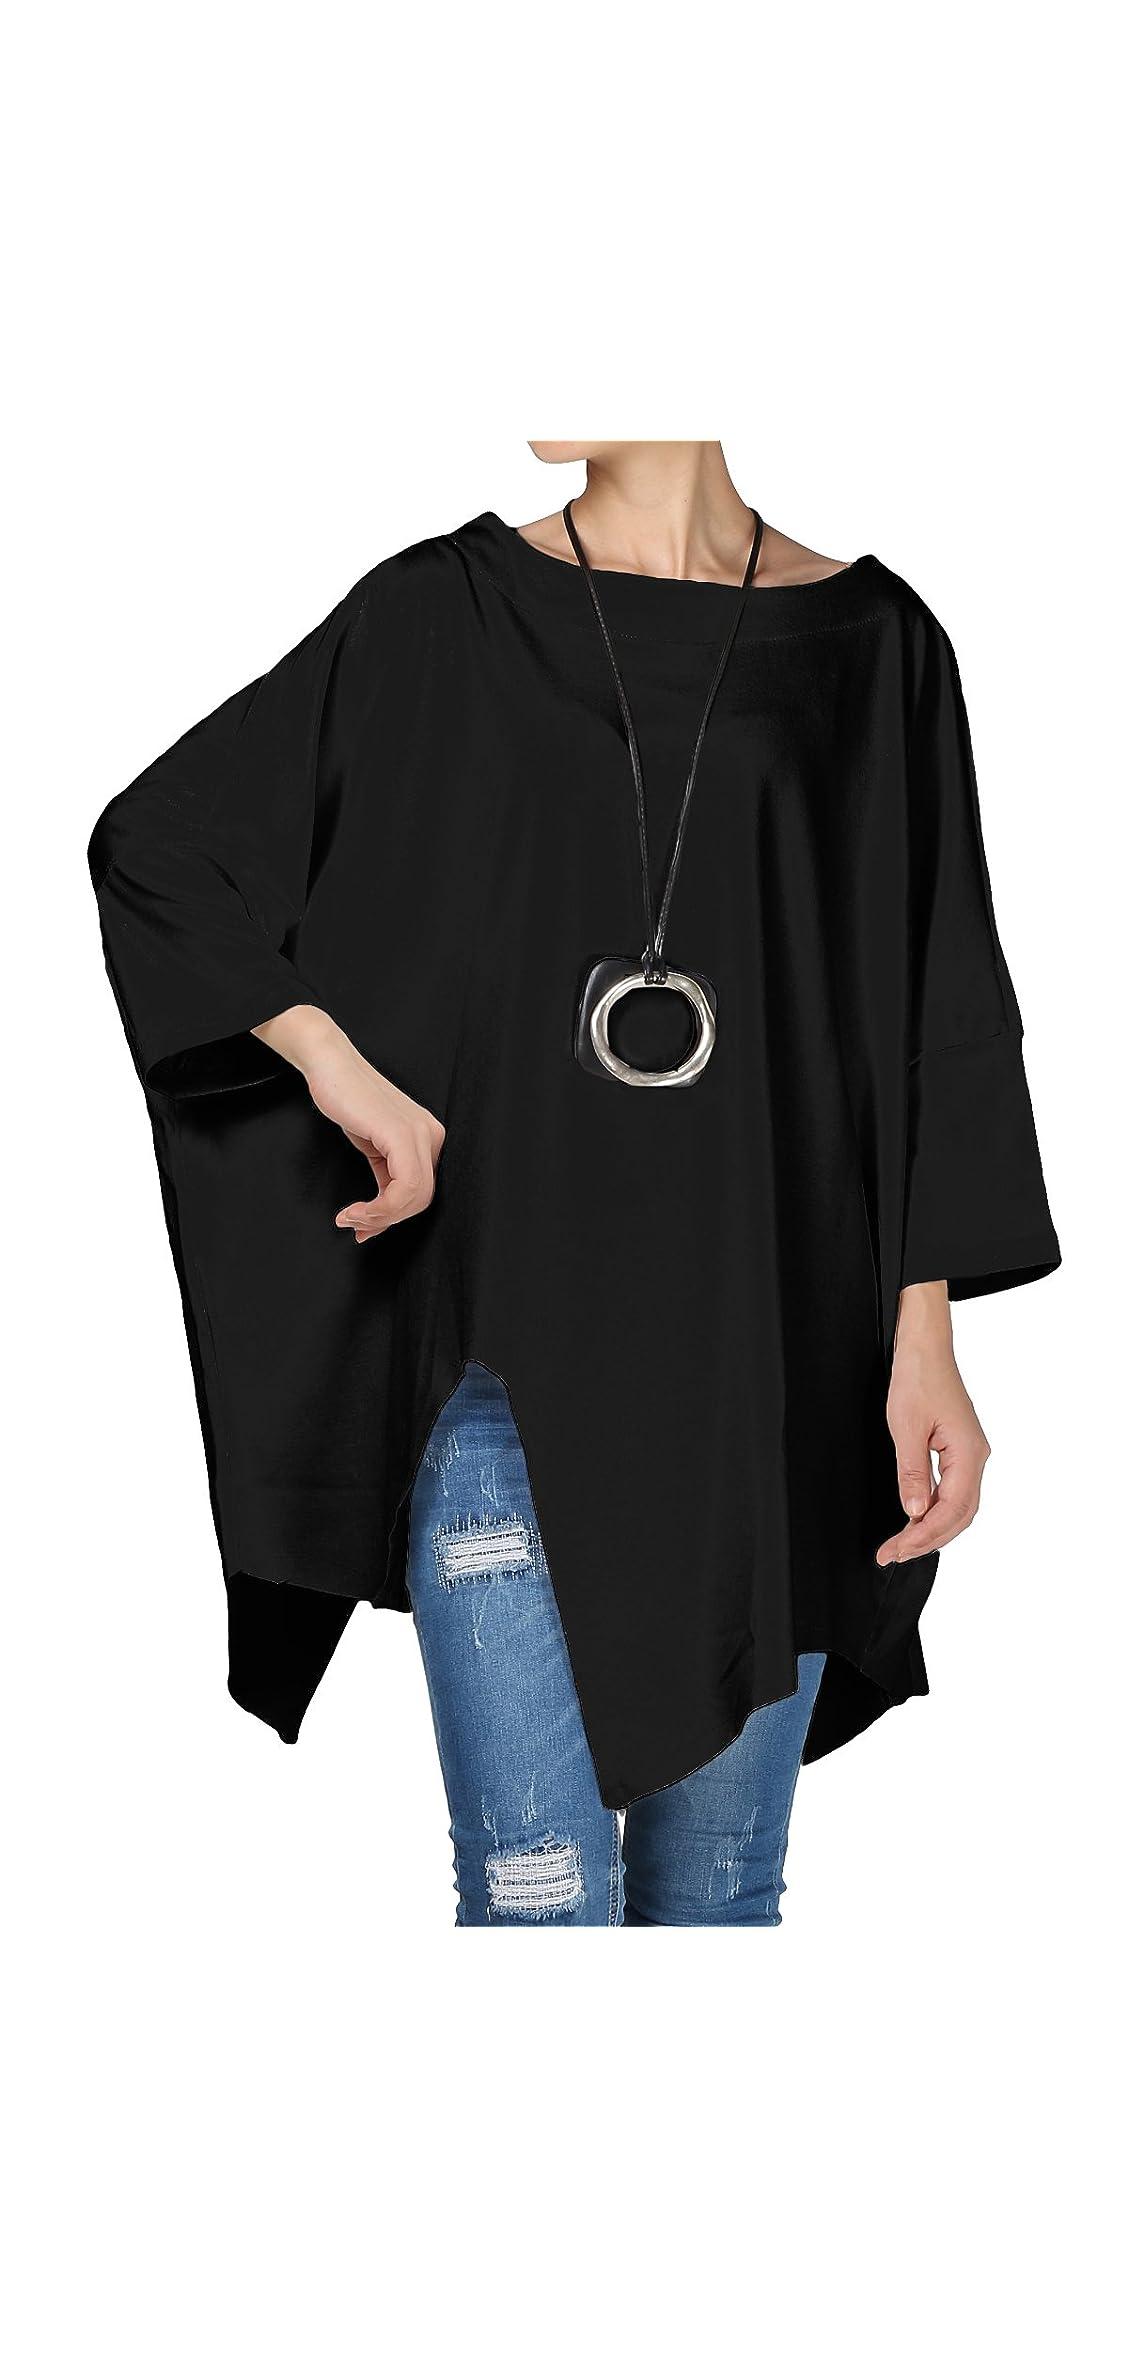 Women's Plus Size Shirt Pullover Tunic Tops Asymmetry